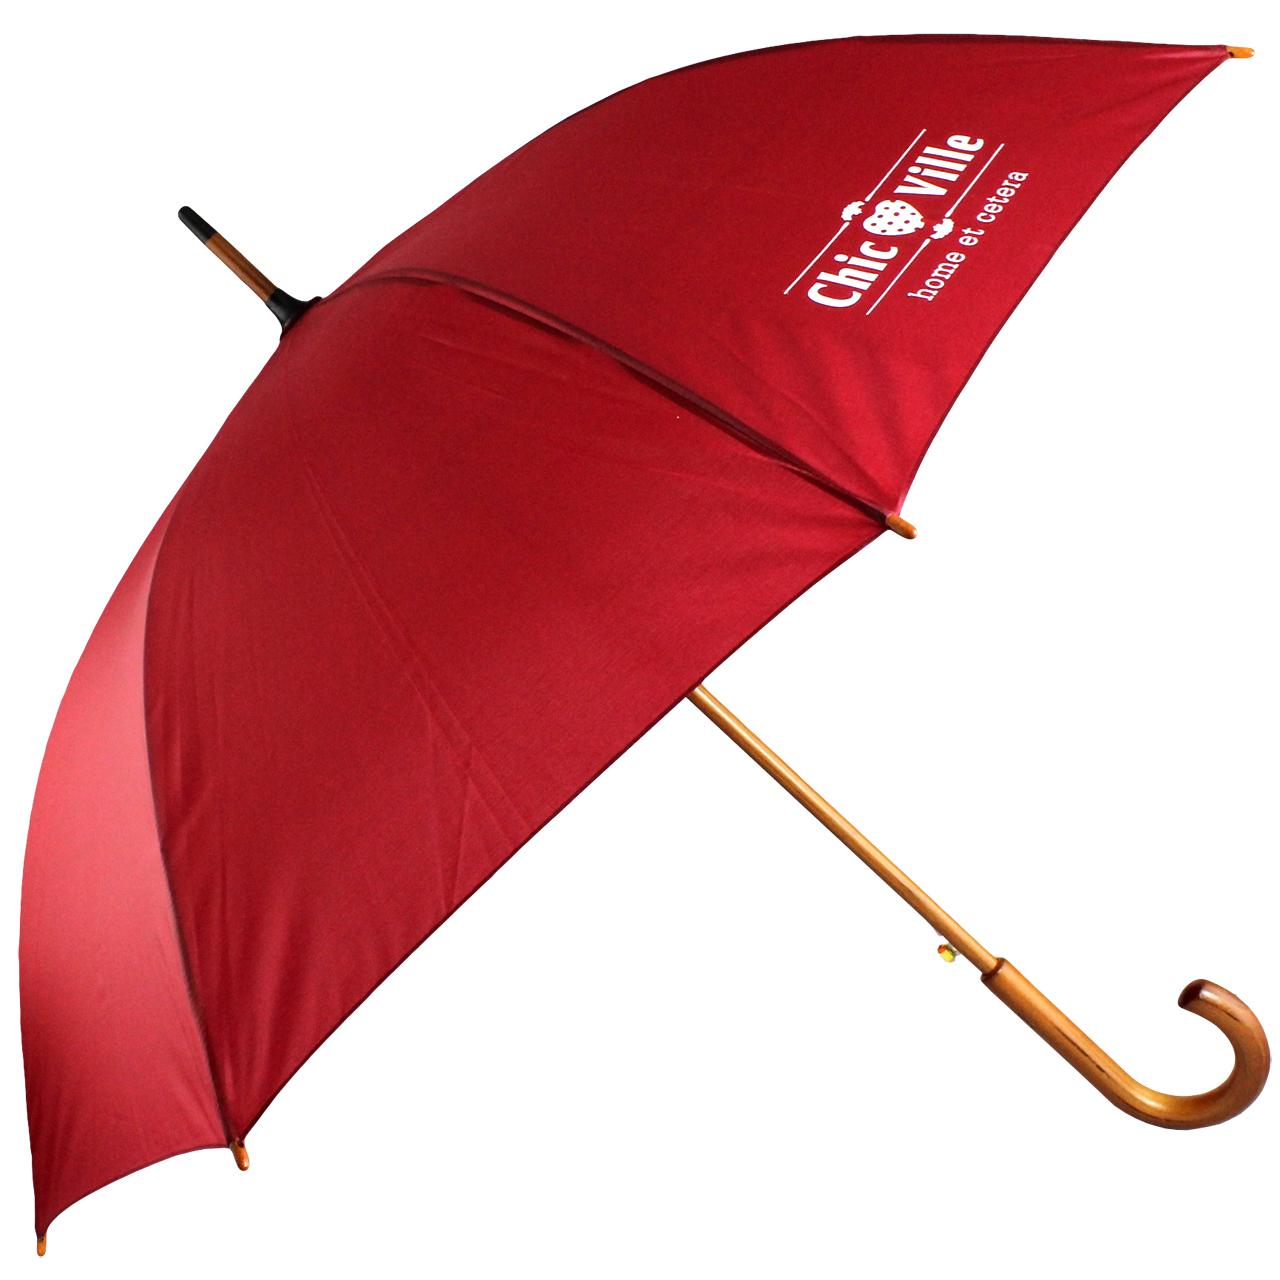 Umbrela din textil visiniu chicville 2021